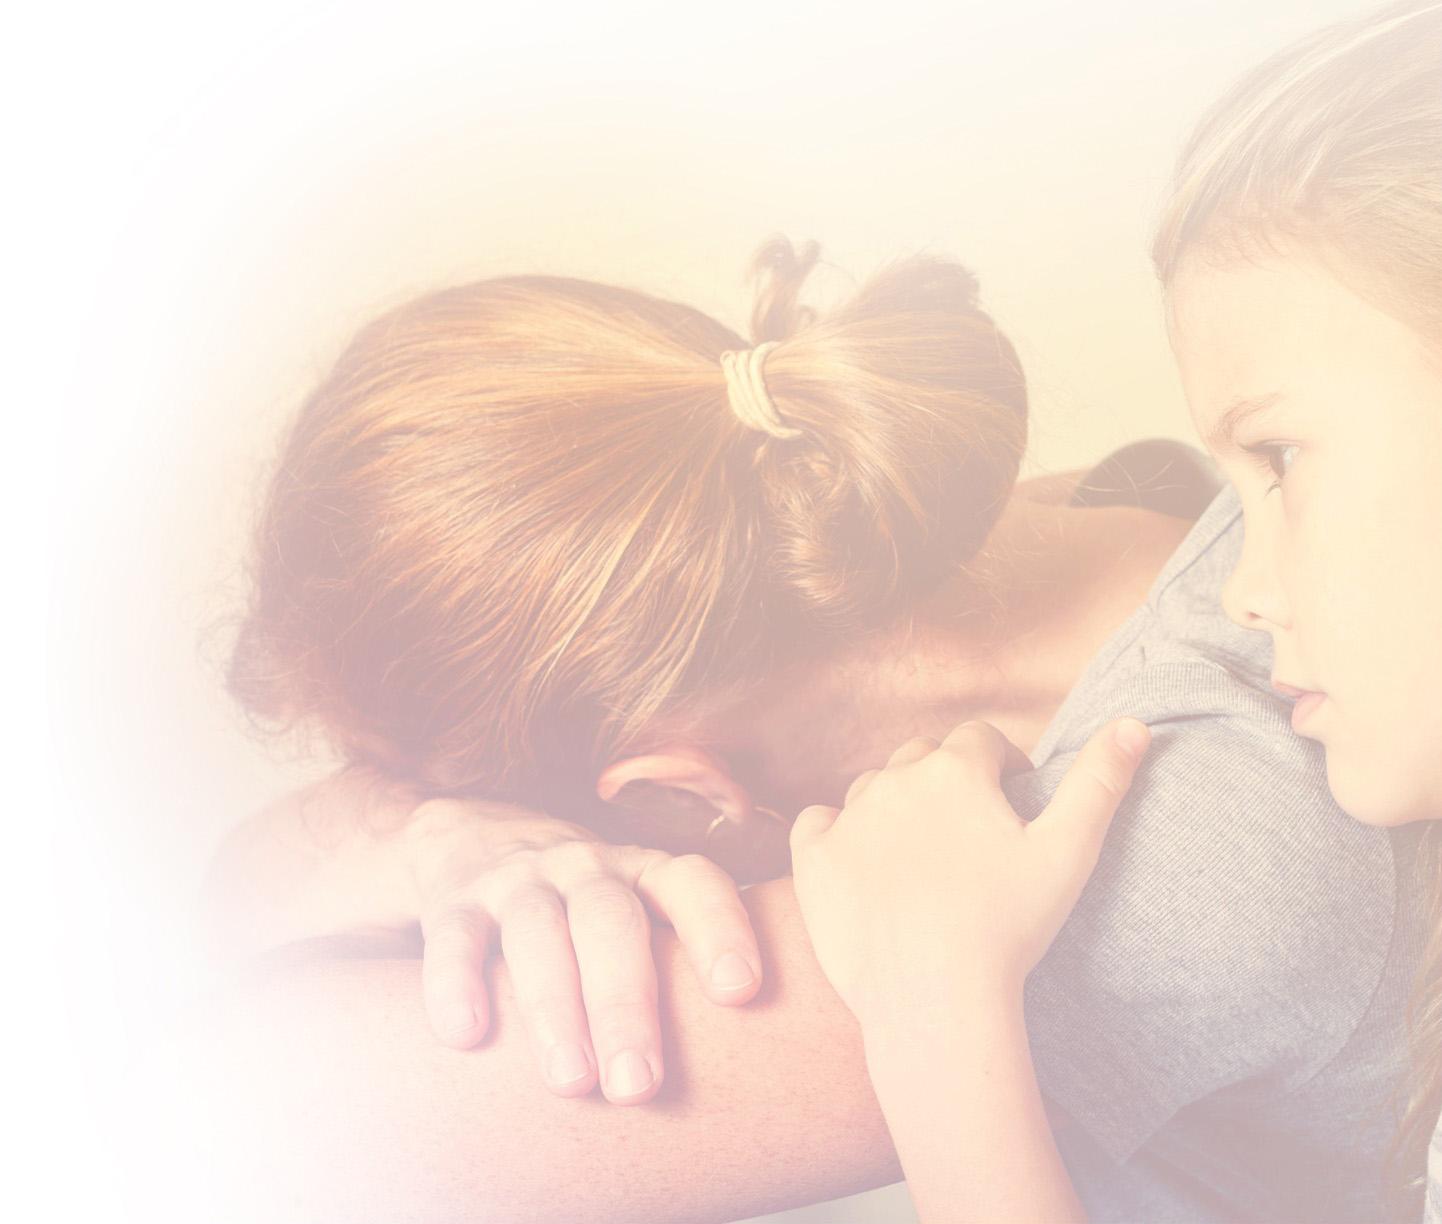 Souffrance | Violence conjugale | Femme | Enfant | Aide